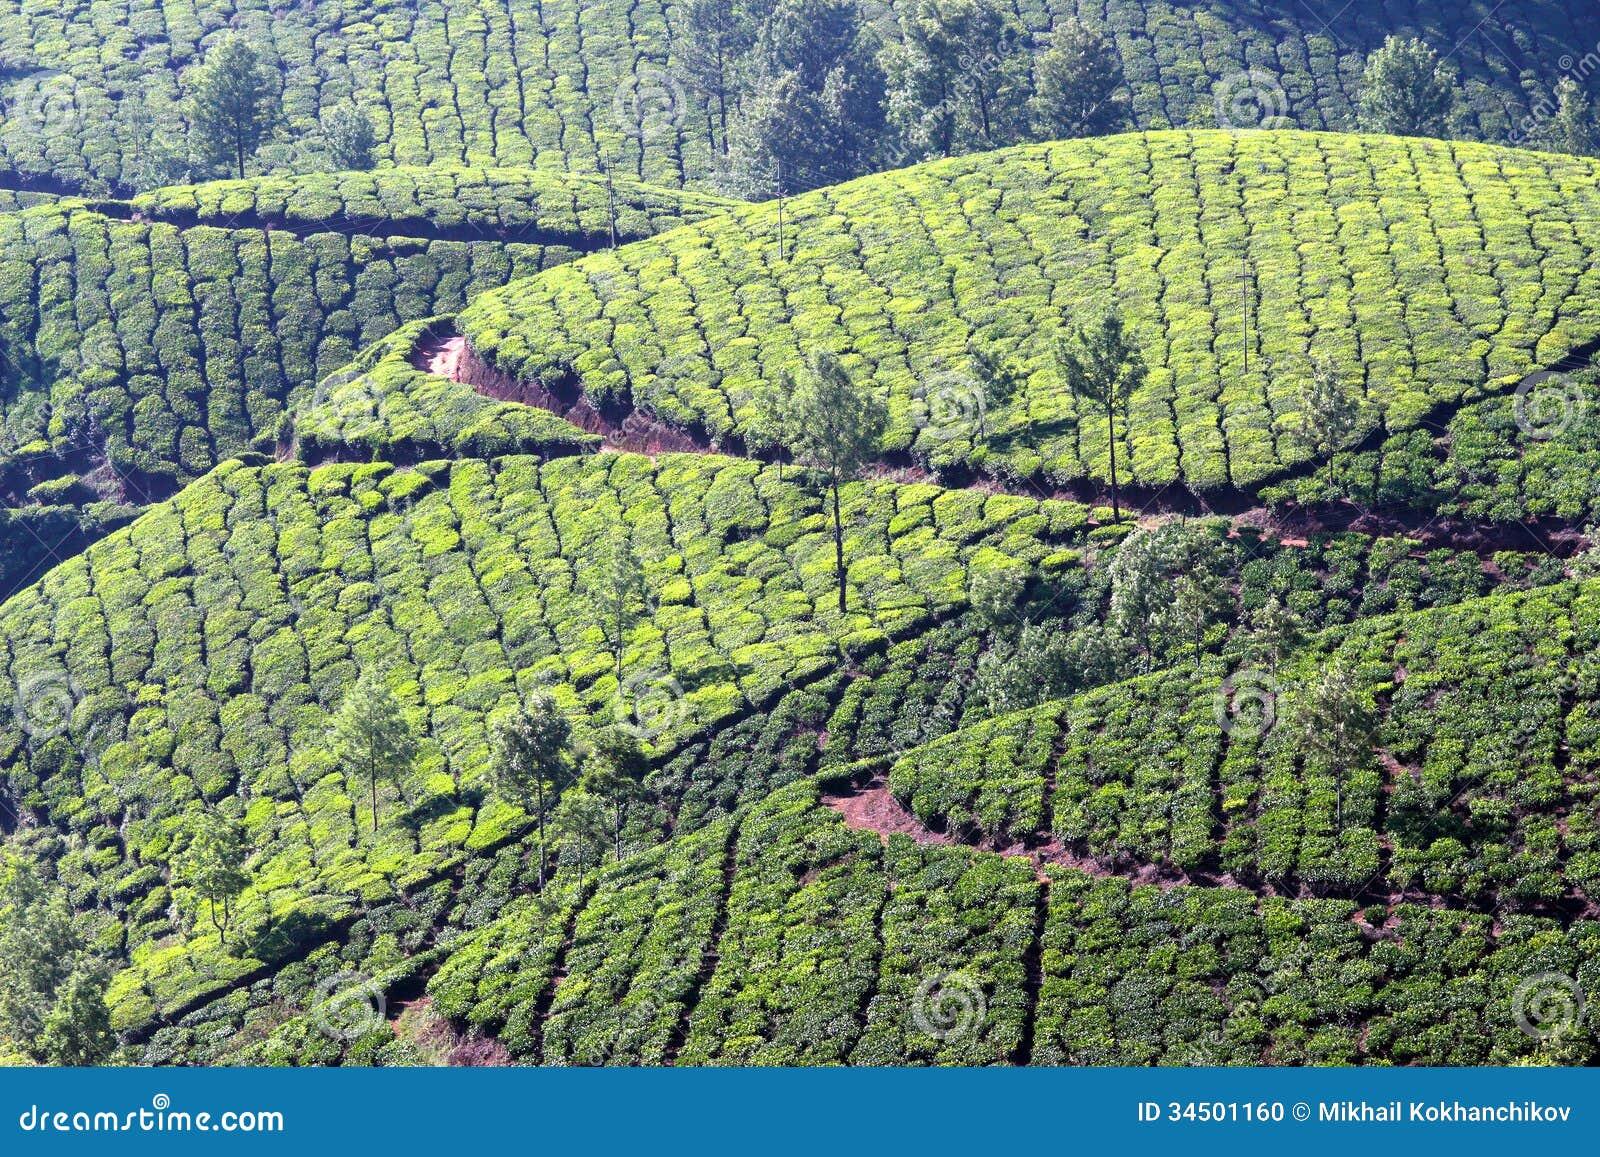 Mountain Tea Plantation In India Stock Photo - Image: 34501160